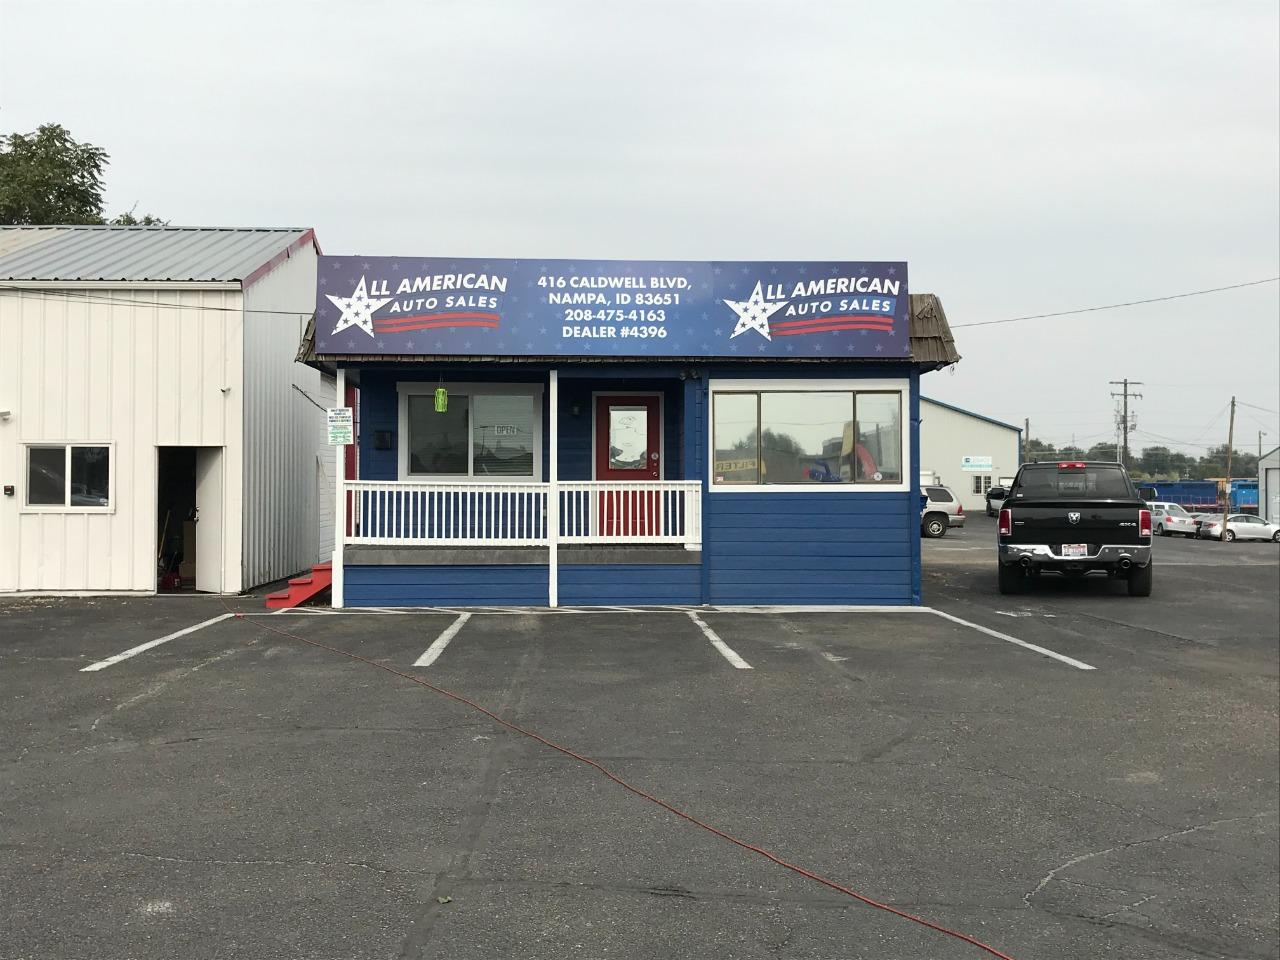 All American Auto Sales LLC